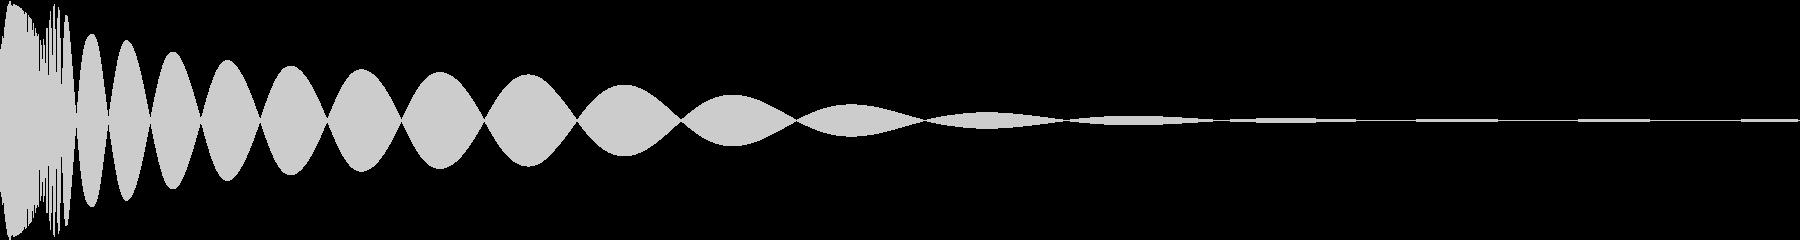 DTM Kick 46 オリジナル音源の未再生の波形